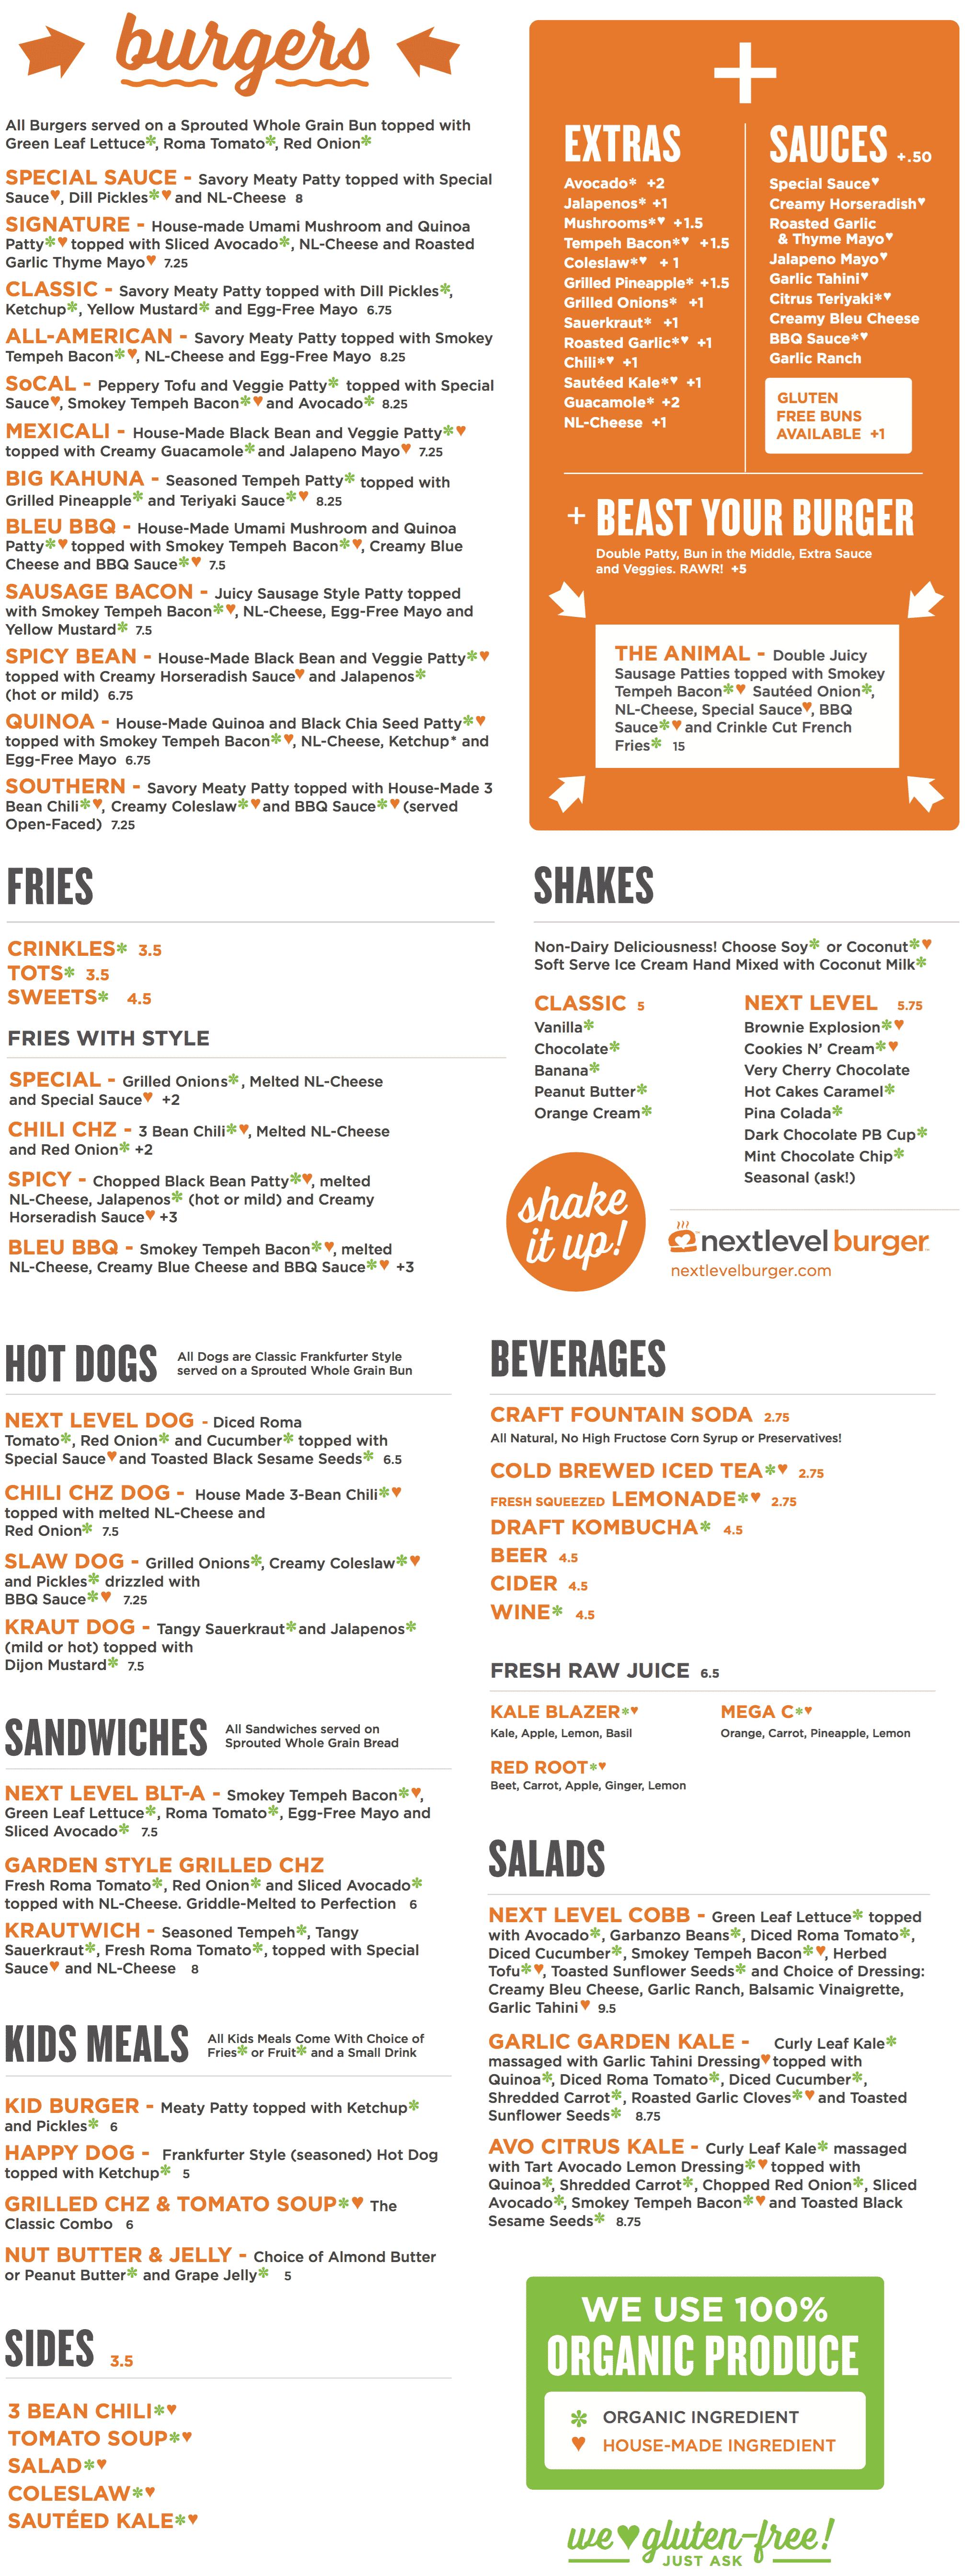 NextLevel Burger Lunch Menu for Lake Oswego and Hawthorne